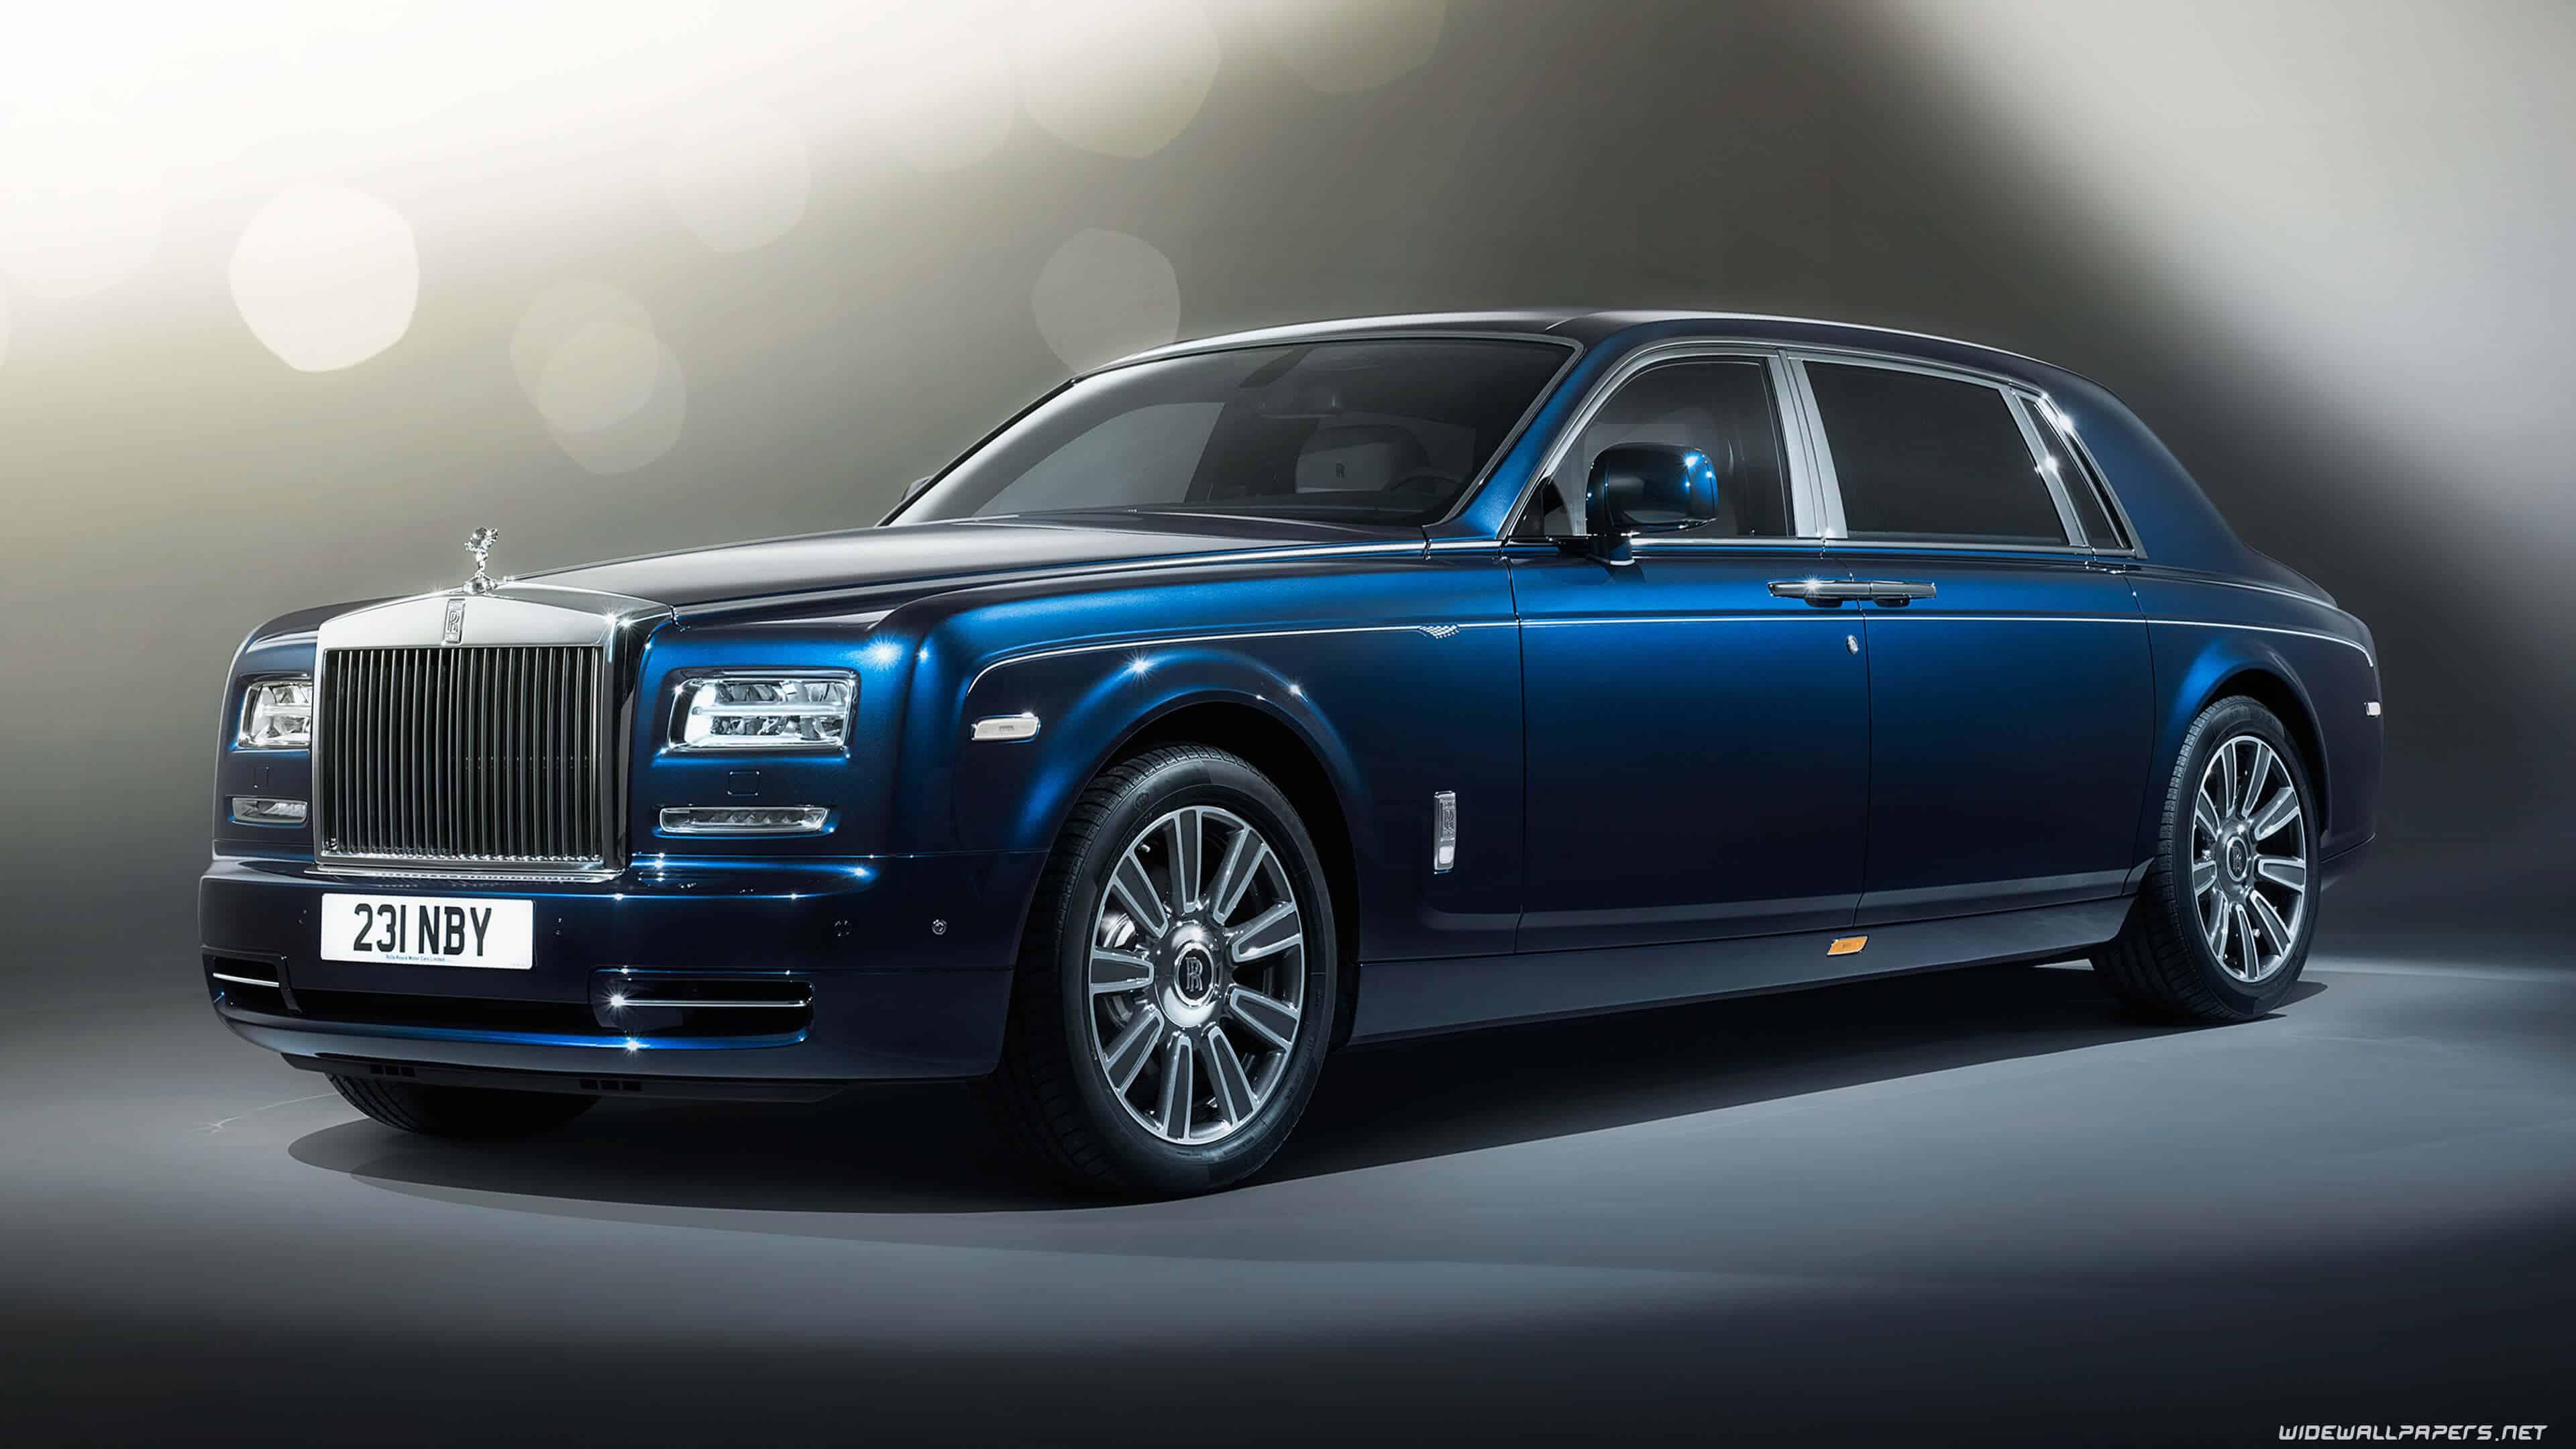 Blue 2017 Rolls Royce Phantom Uhd 4k Wallpaper Pixelz